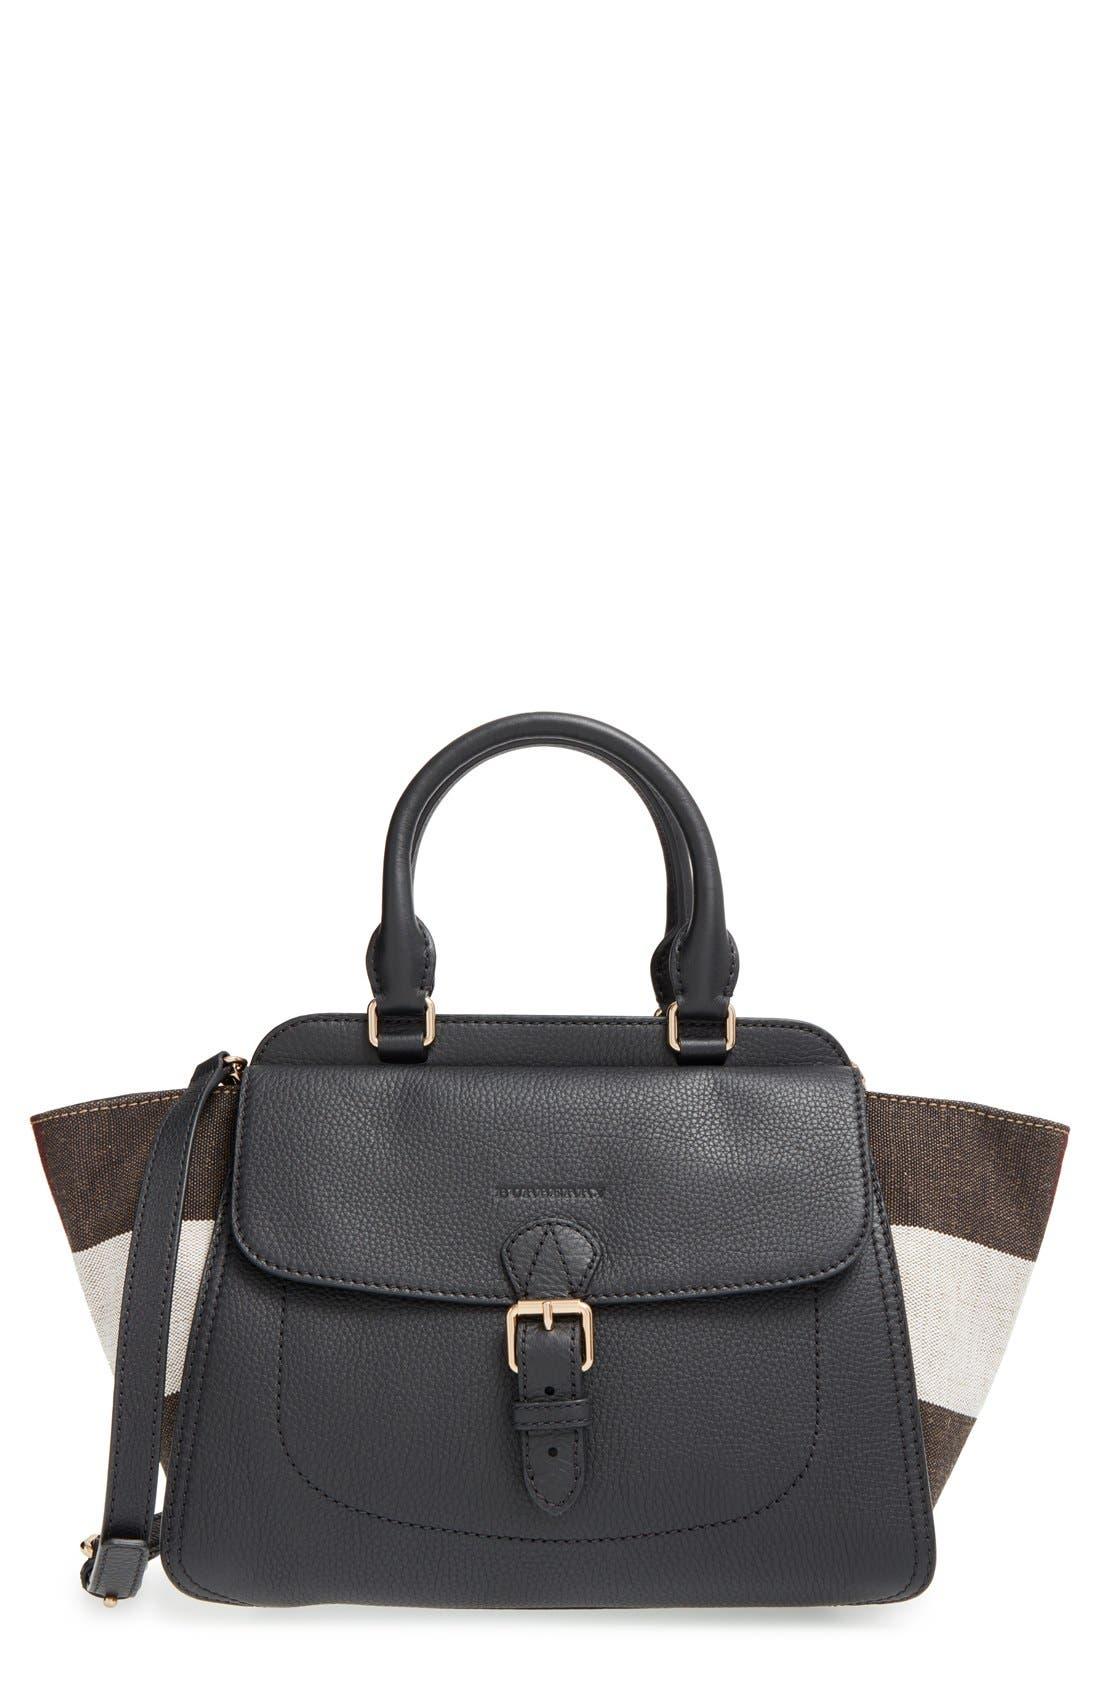 BURBERRY 'Medium Harcourt' Check & Pebbled Leather Satchel, Main, color, 001